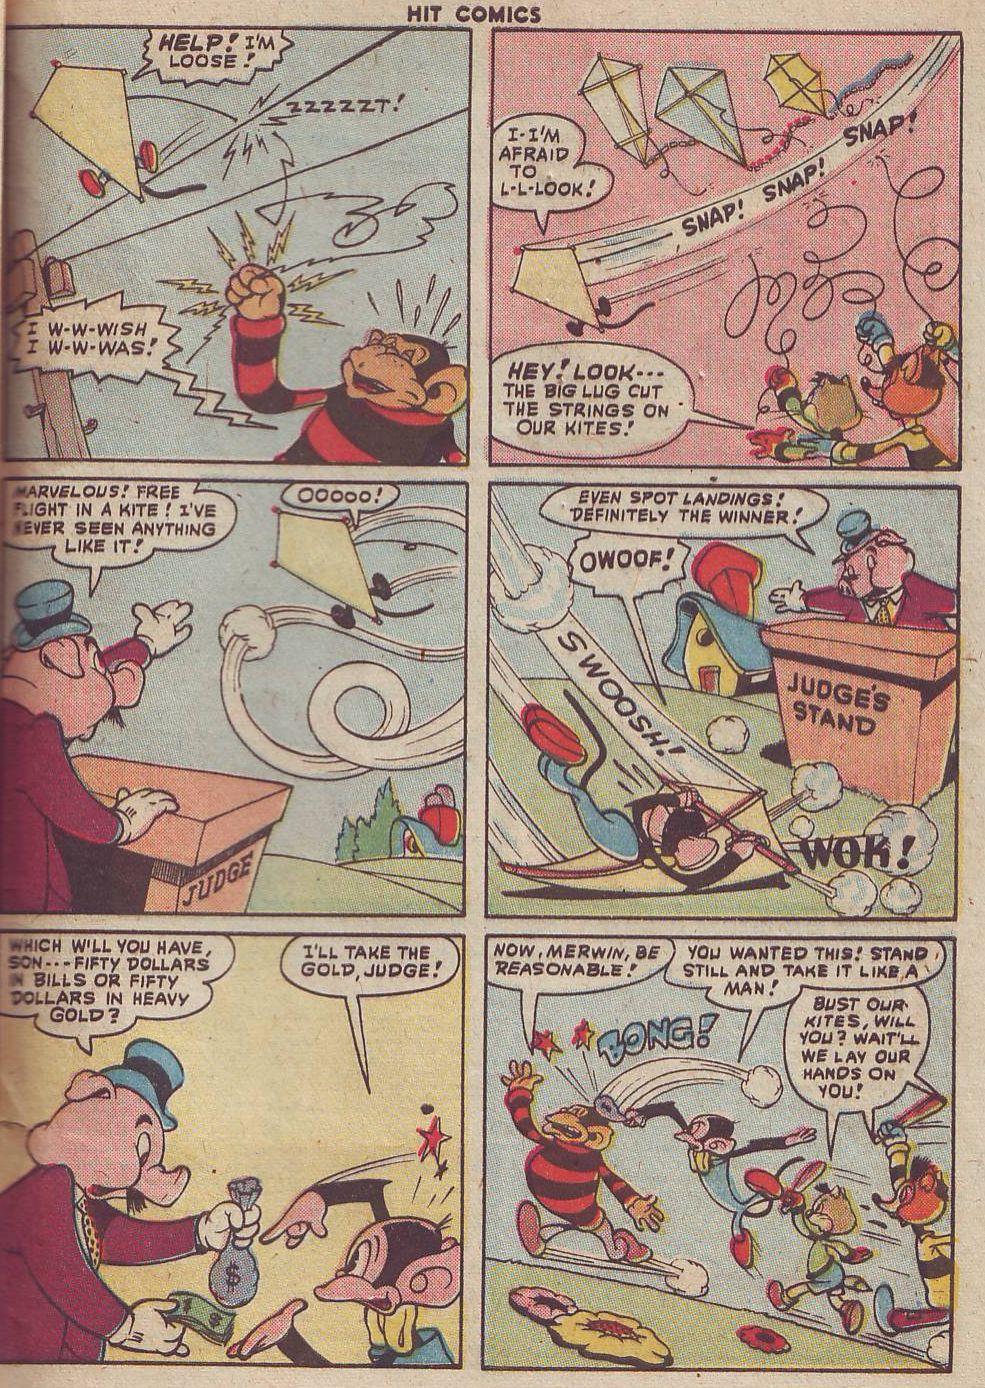 Read online Hit Comics comic -  Issue #51 - 49